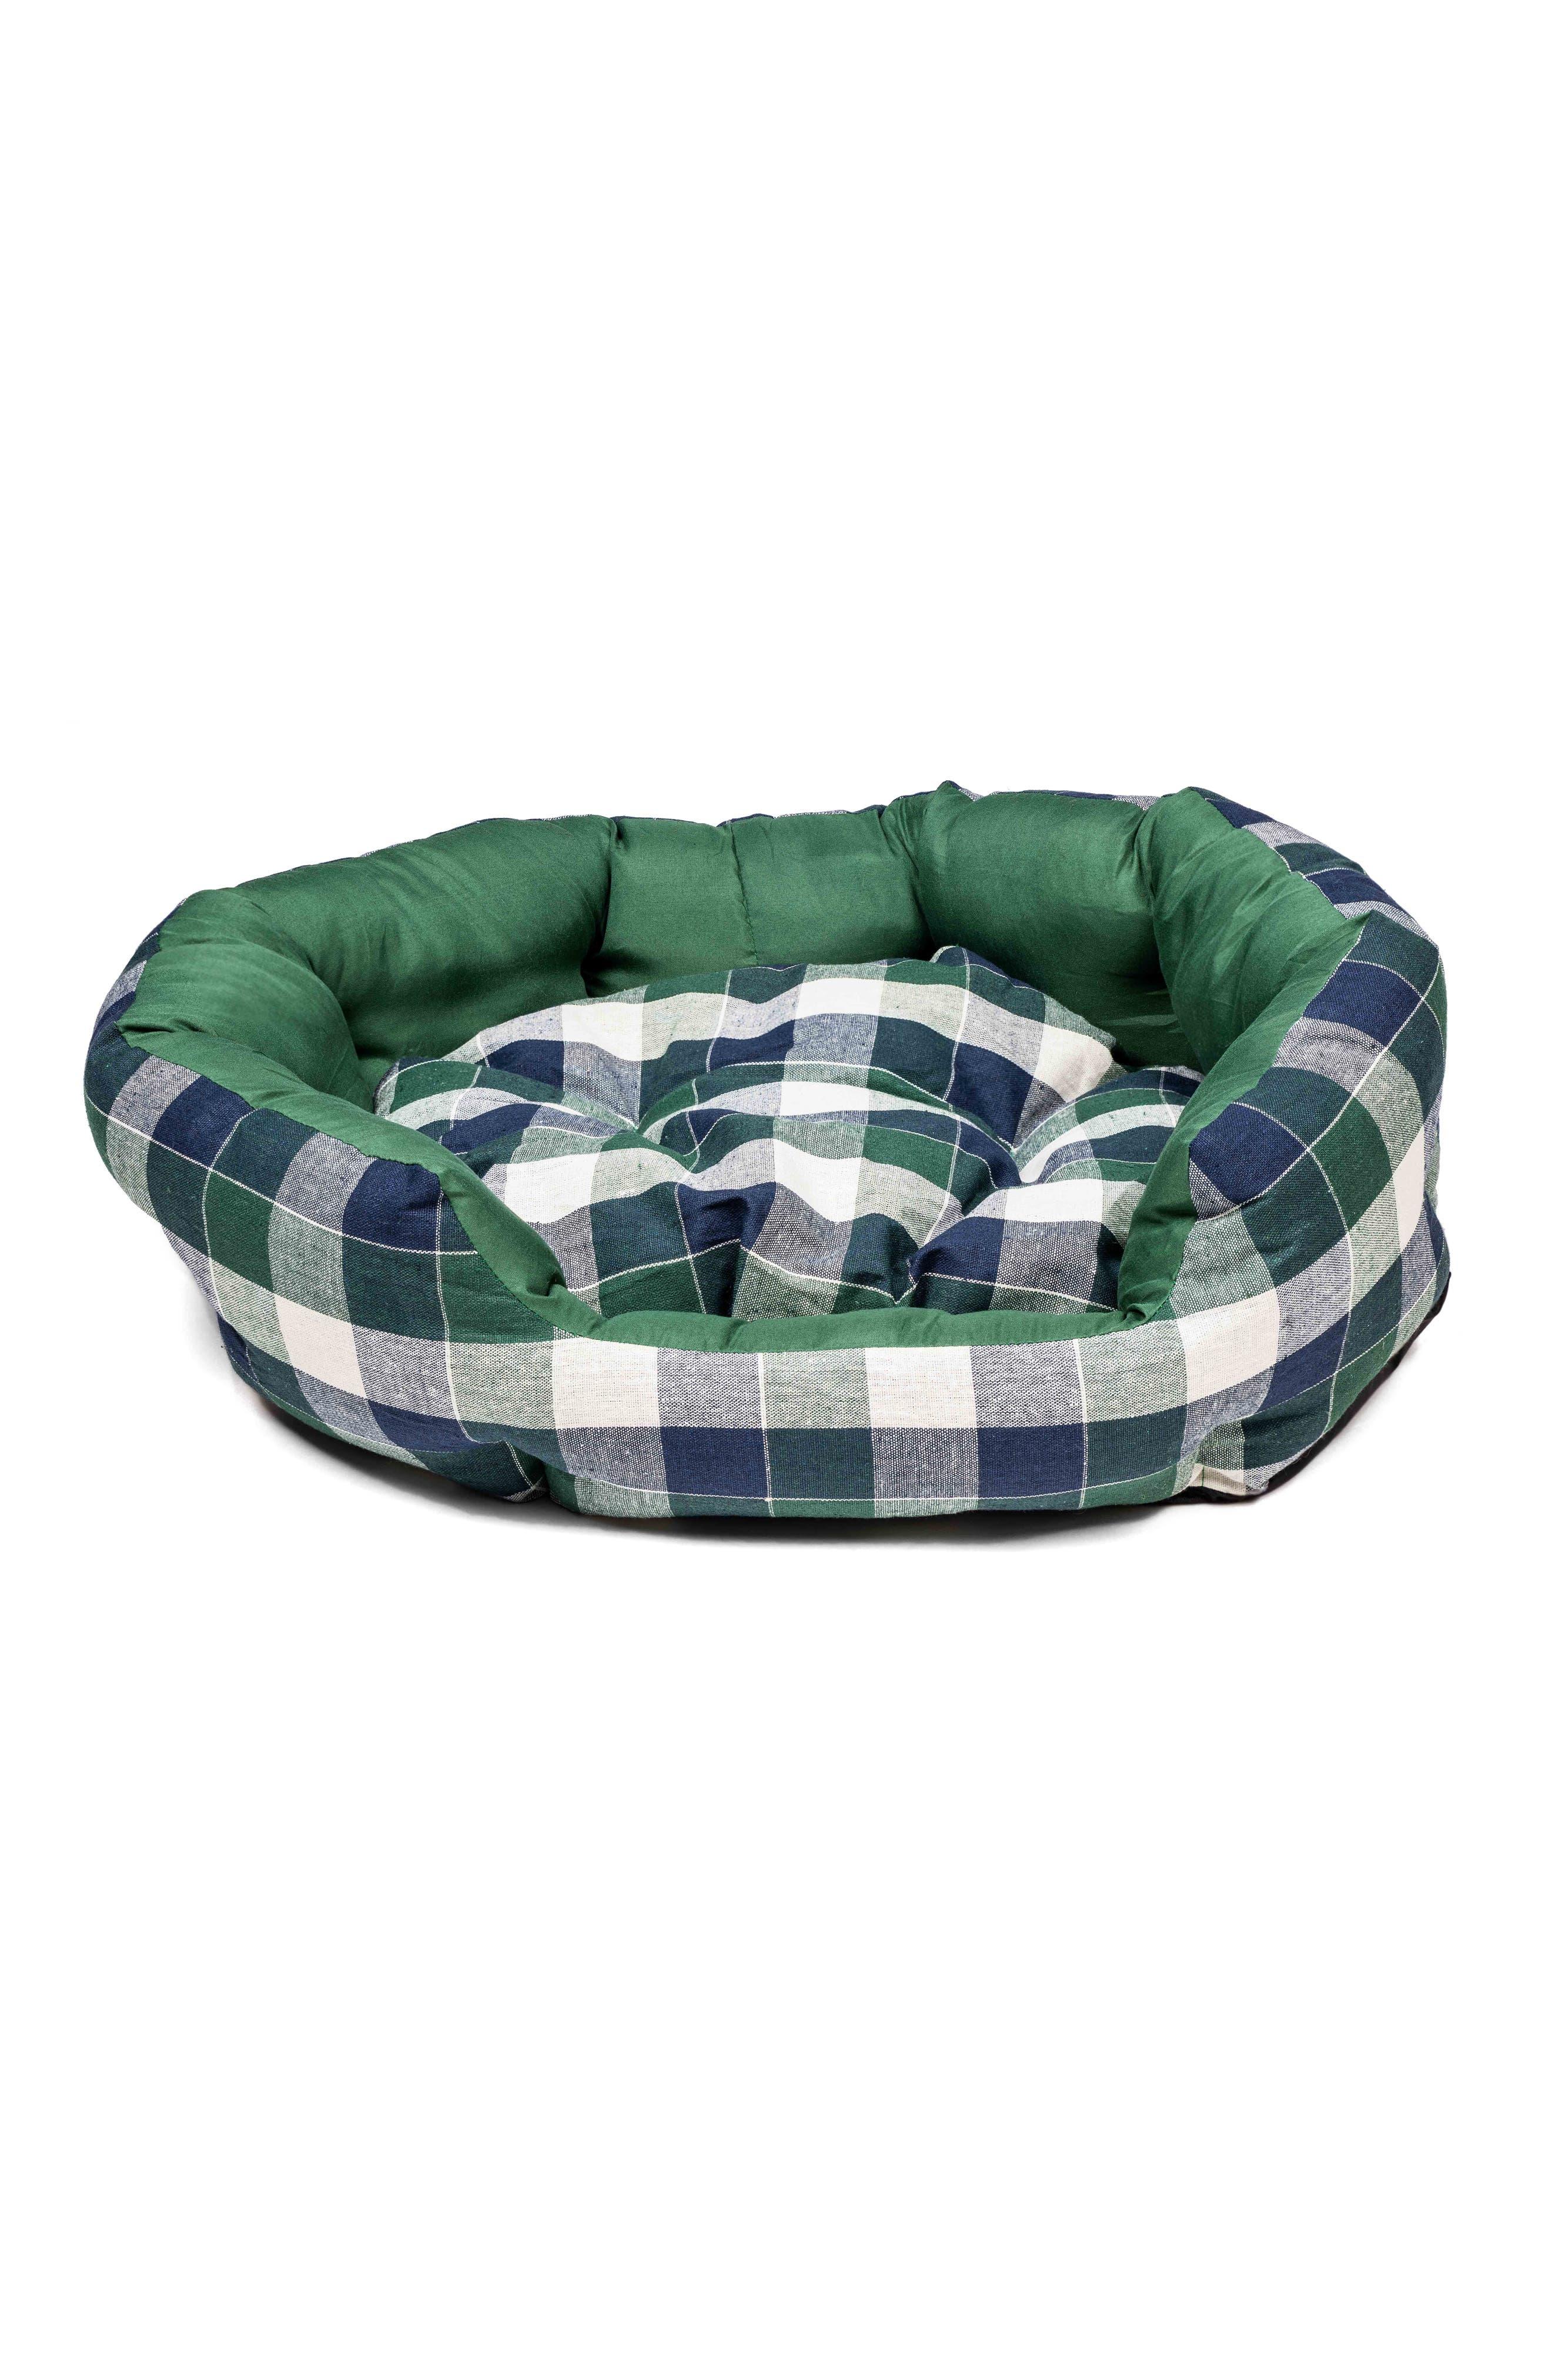 Hasley Round Pet Bed,                             Main thumbnail 1, color,                             Green